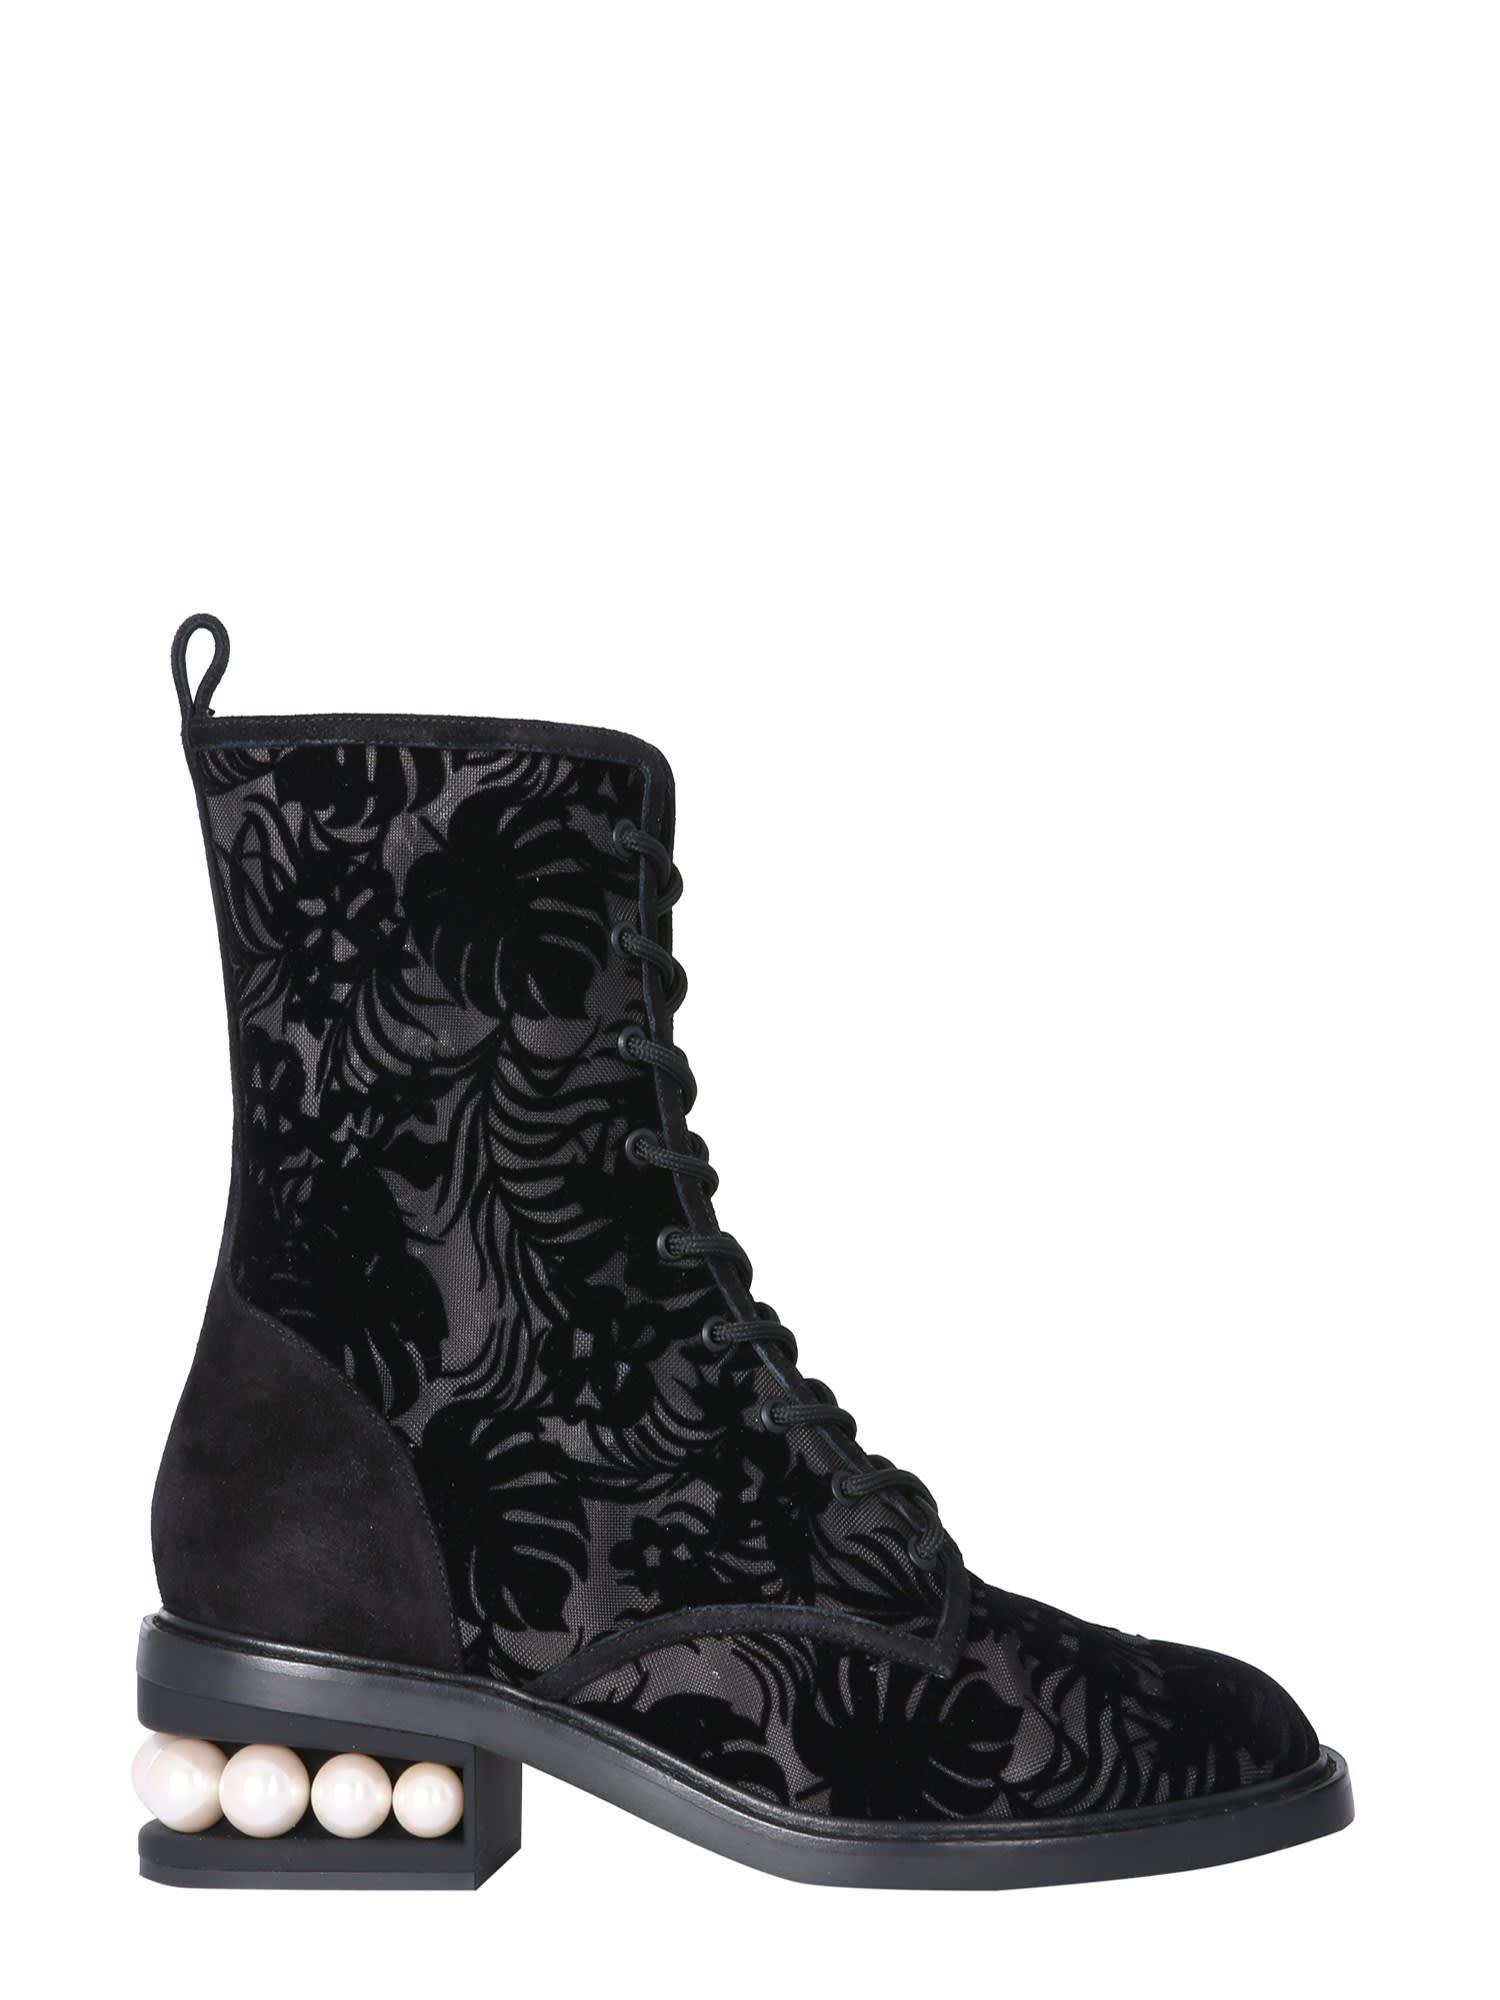 Buy Nicholas Kirkwood Casati Boots online, shop Nicholas Kirkwood shoes with free shipping